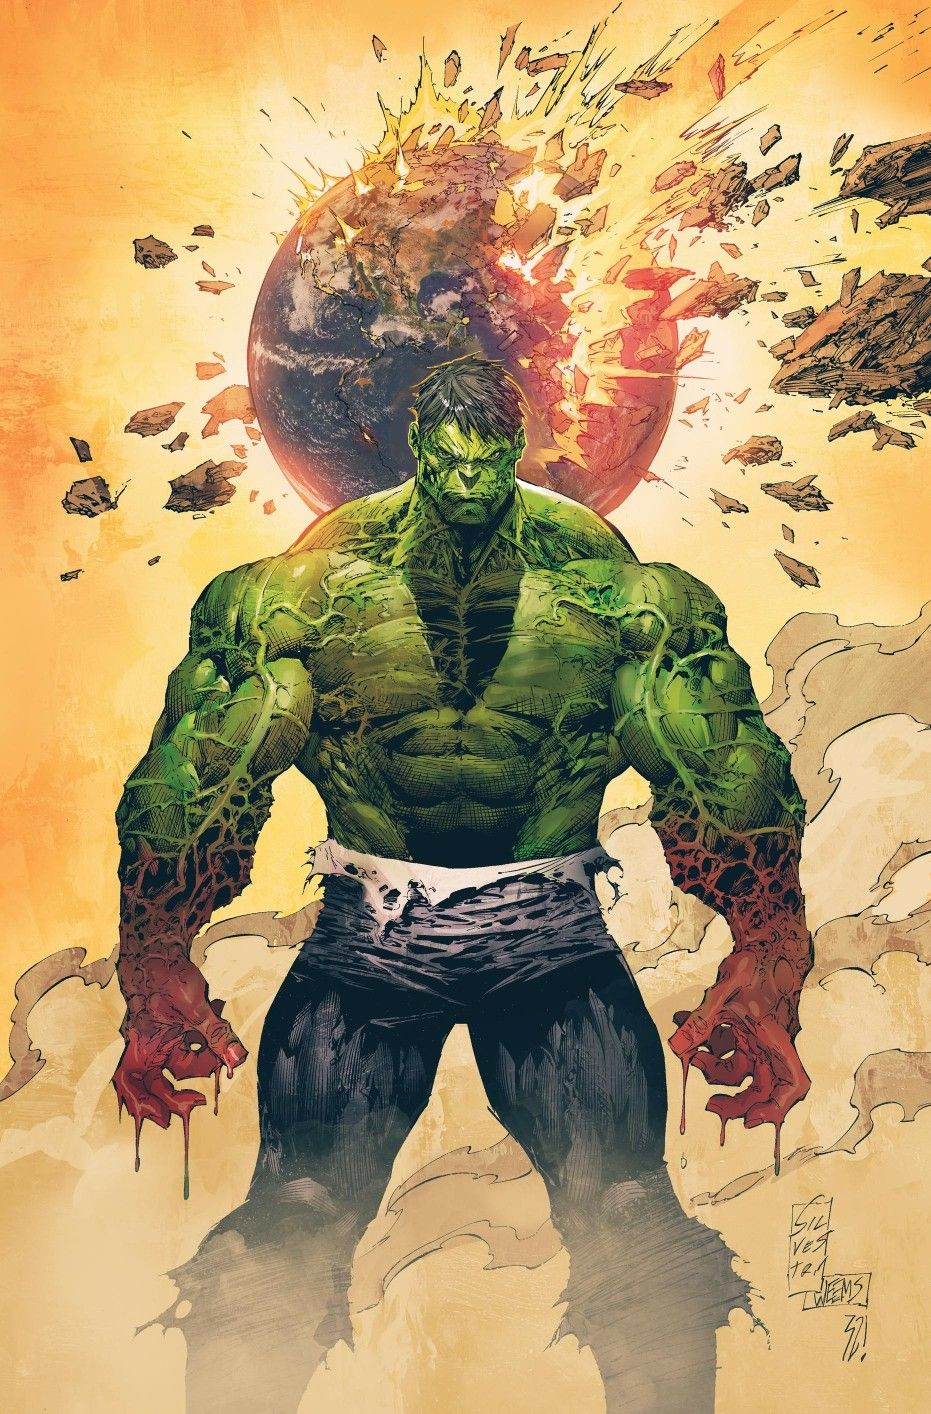 WORLDBREAKERHULK!!! Hulk marvel, Marvel, The incredibles